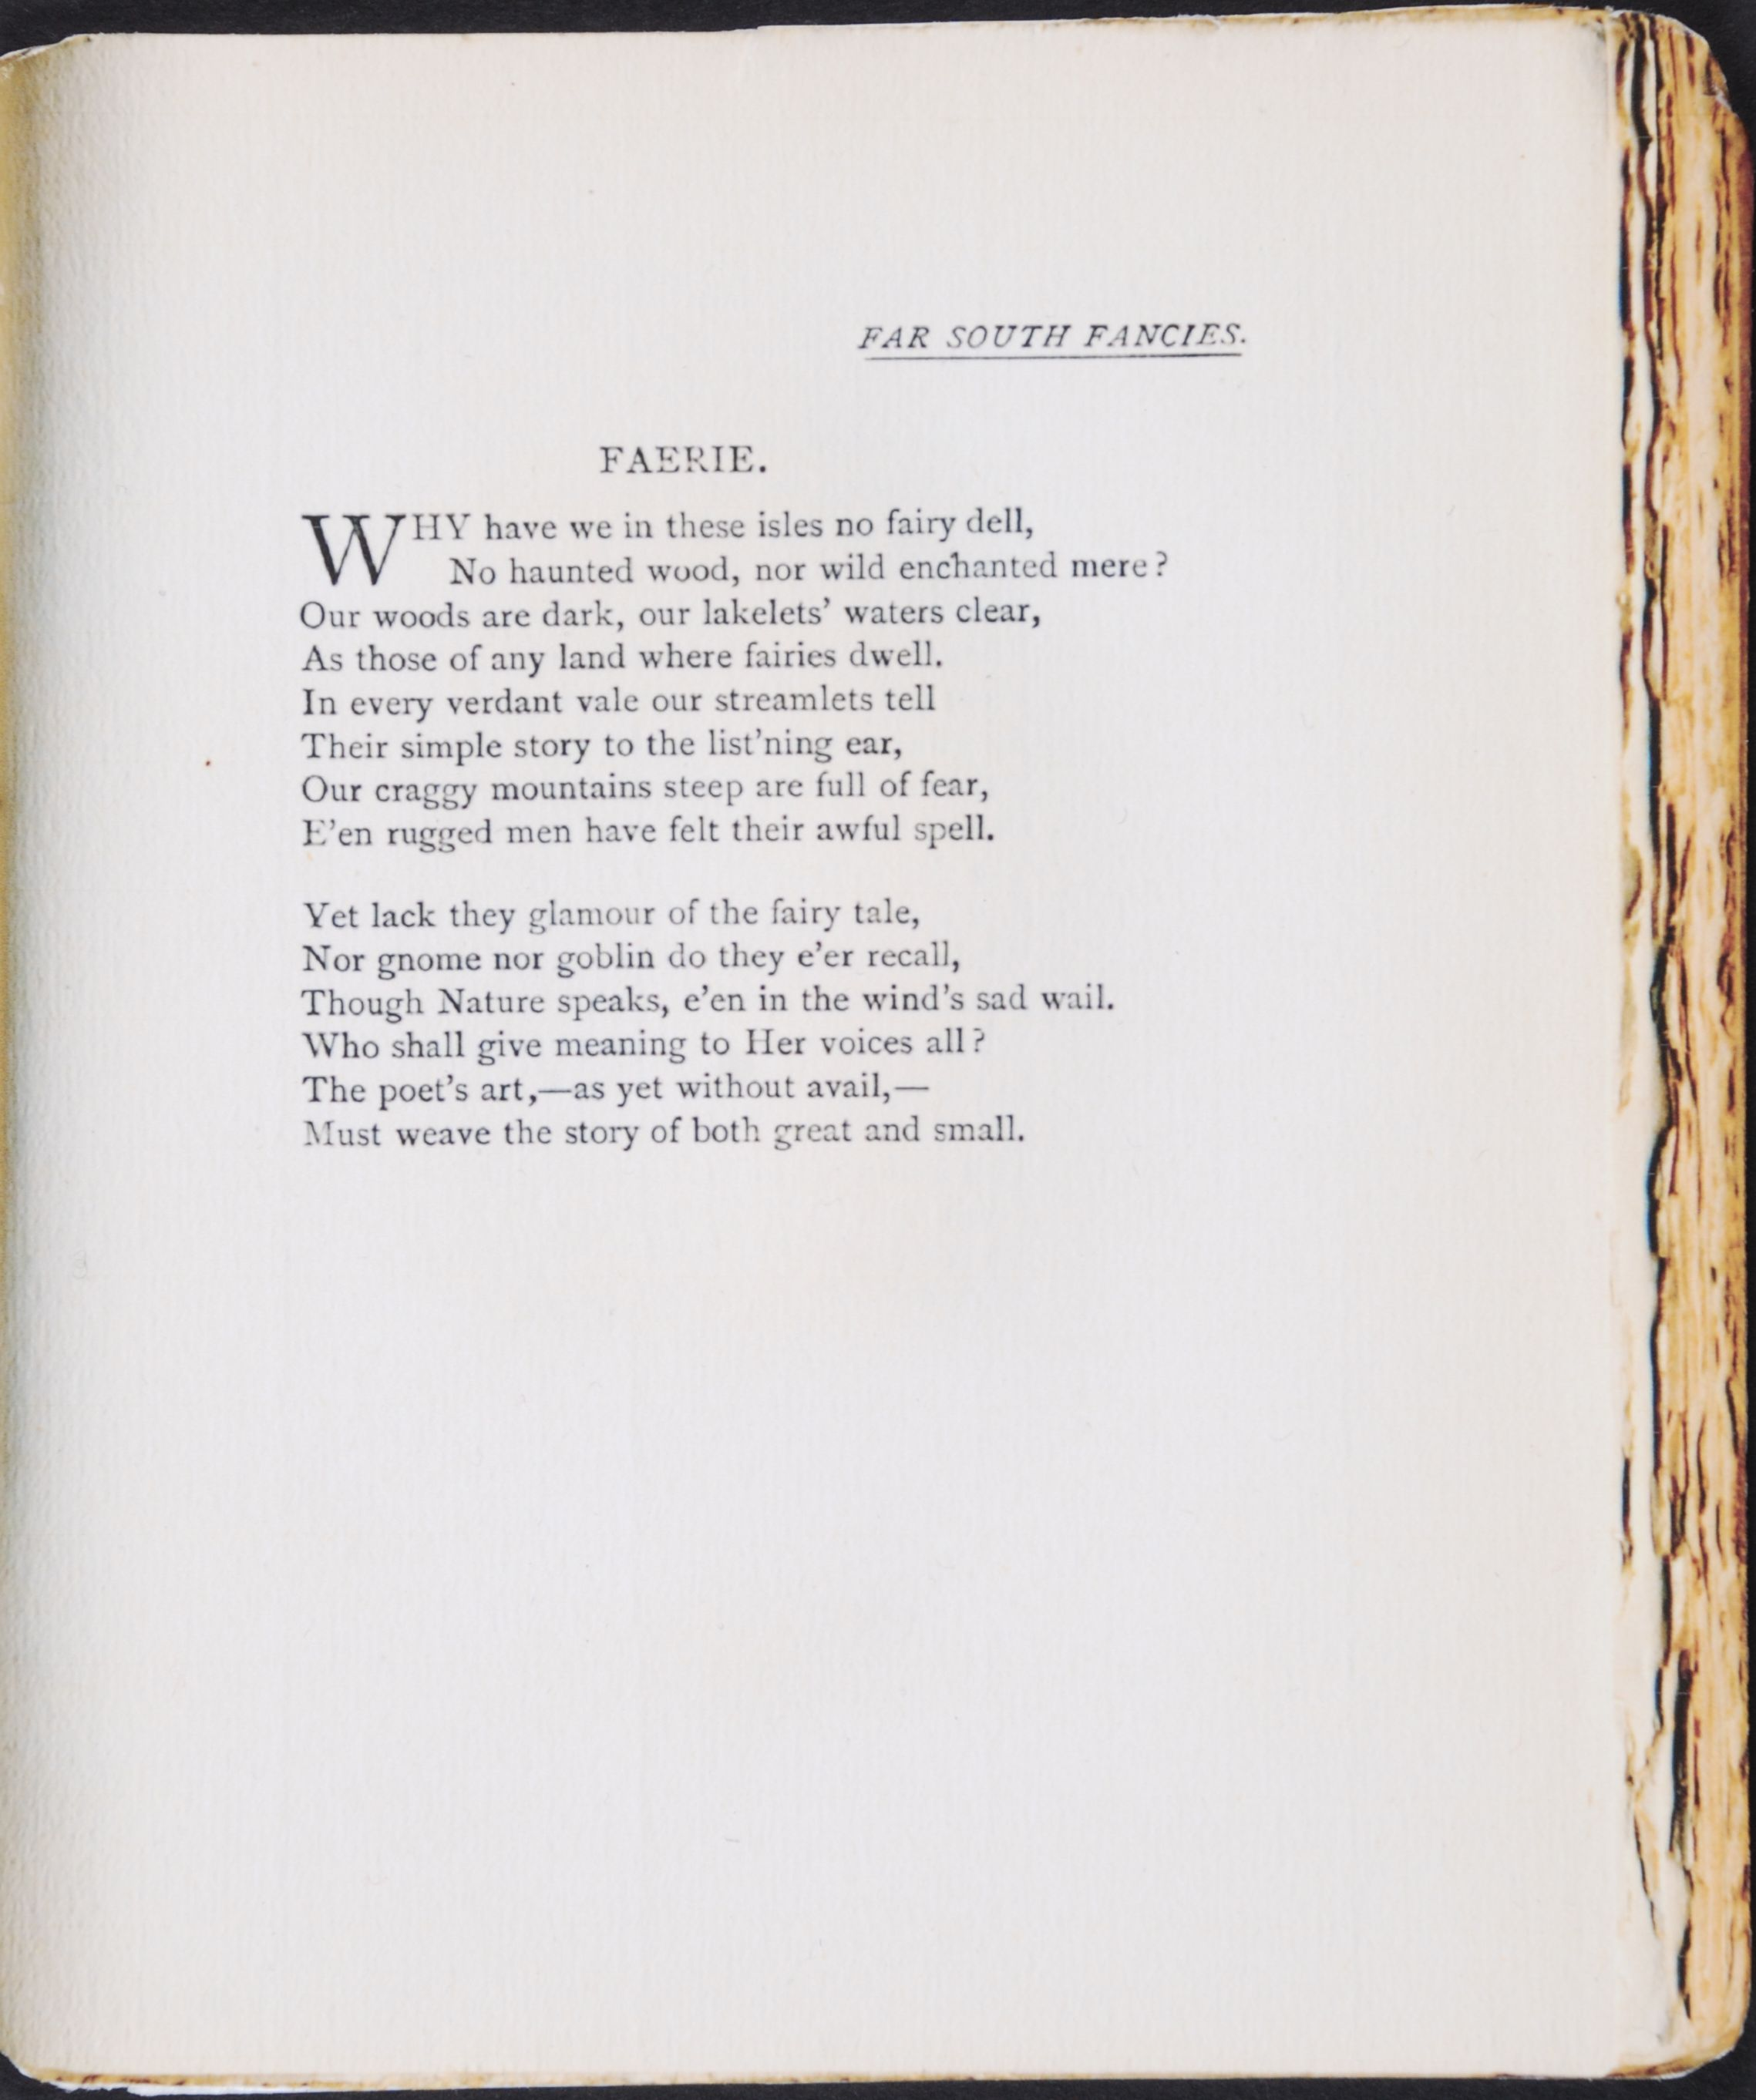 Alexander Bathgate. Far south fancies. London: Griffith, Farran, Okeden & Welsh [1890].